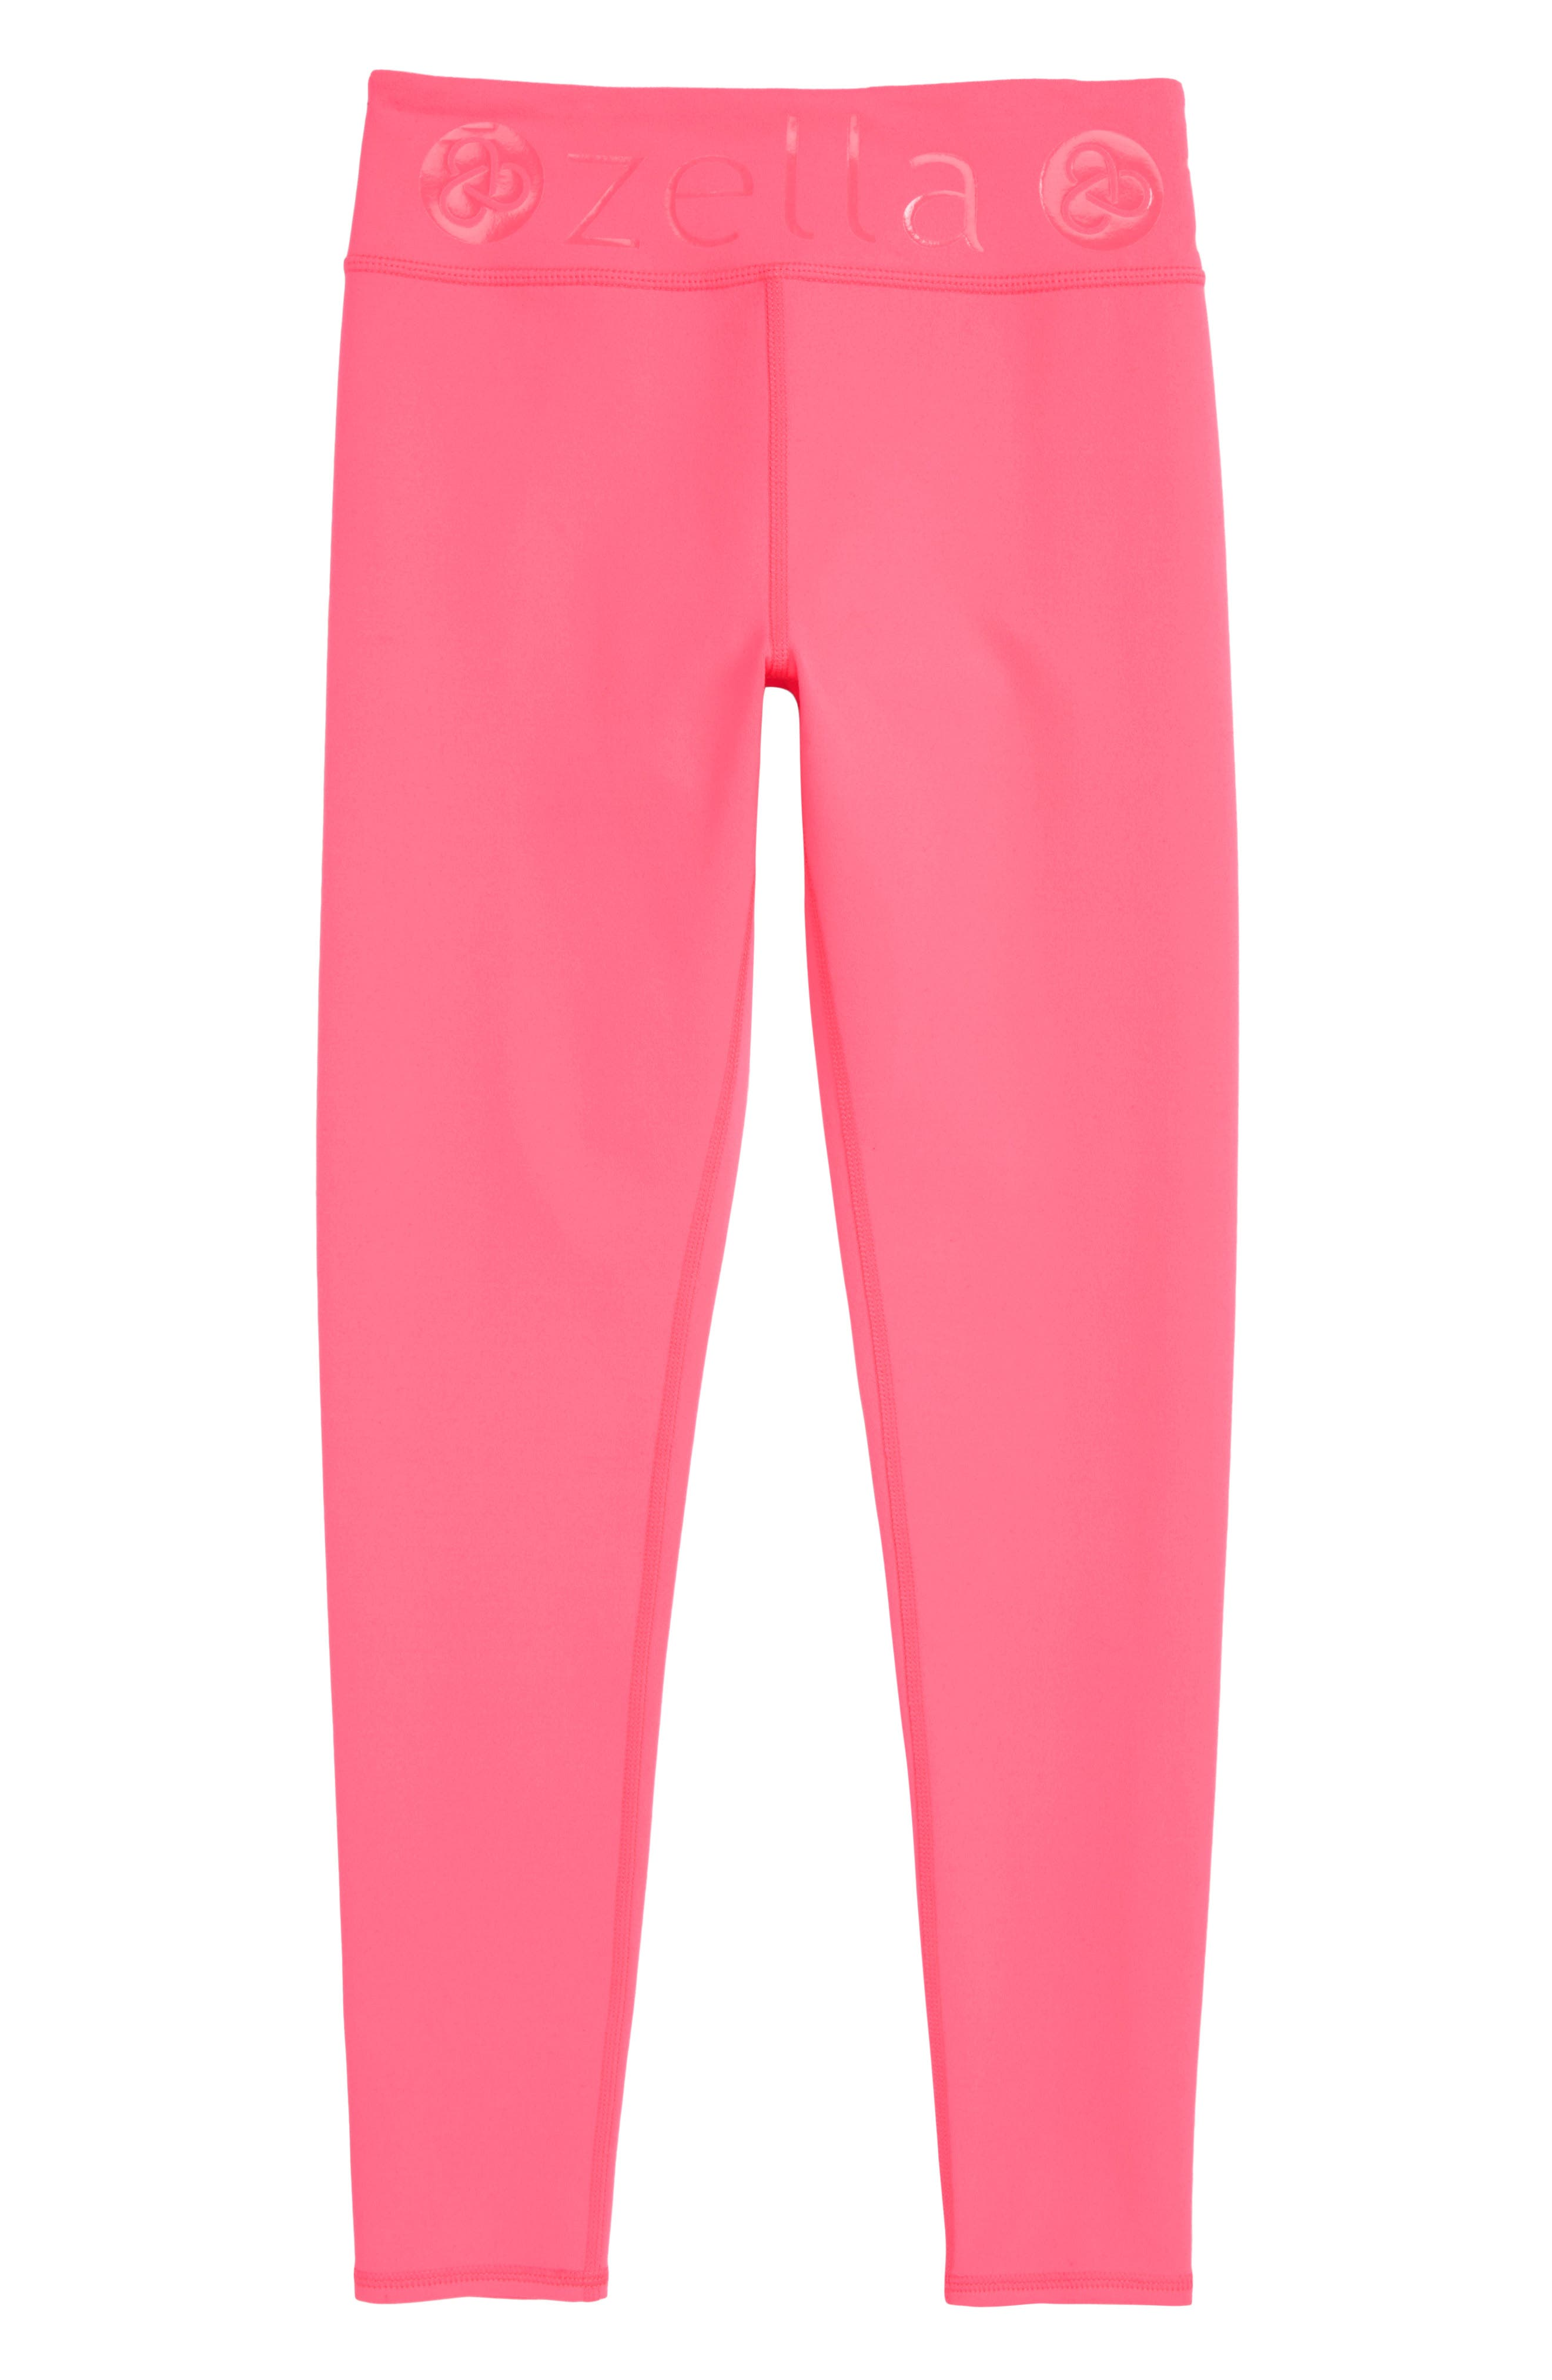 High Waist Leggings,                         Main,                         color, Pink Neon